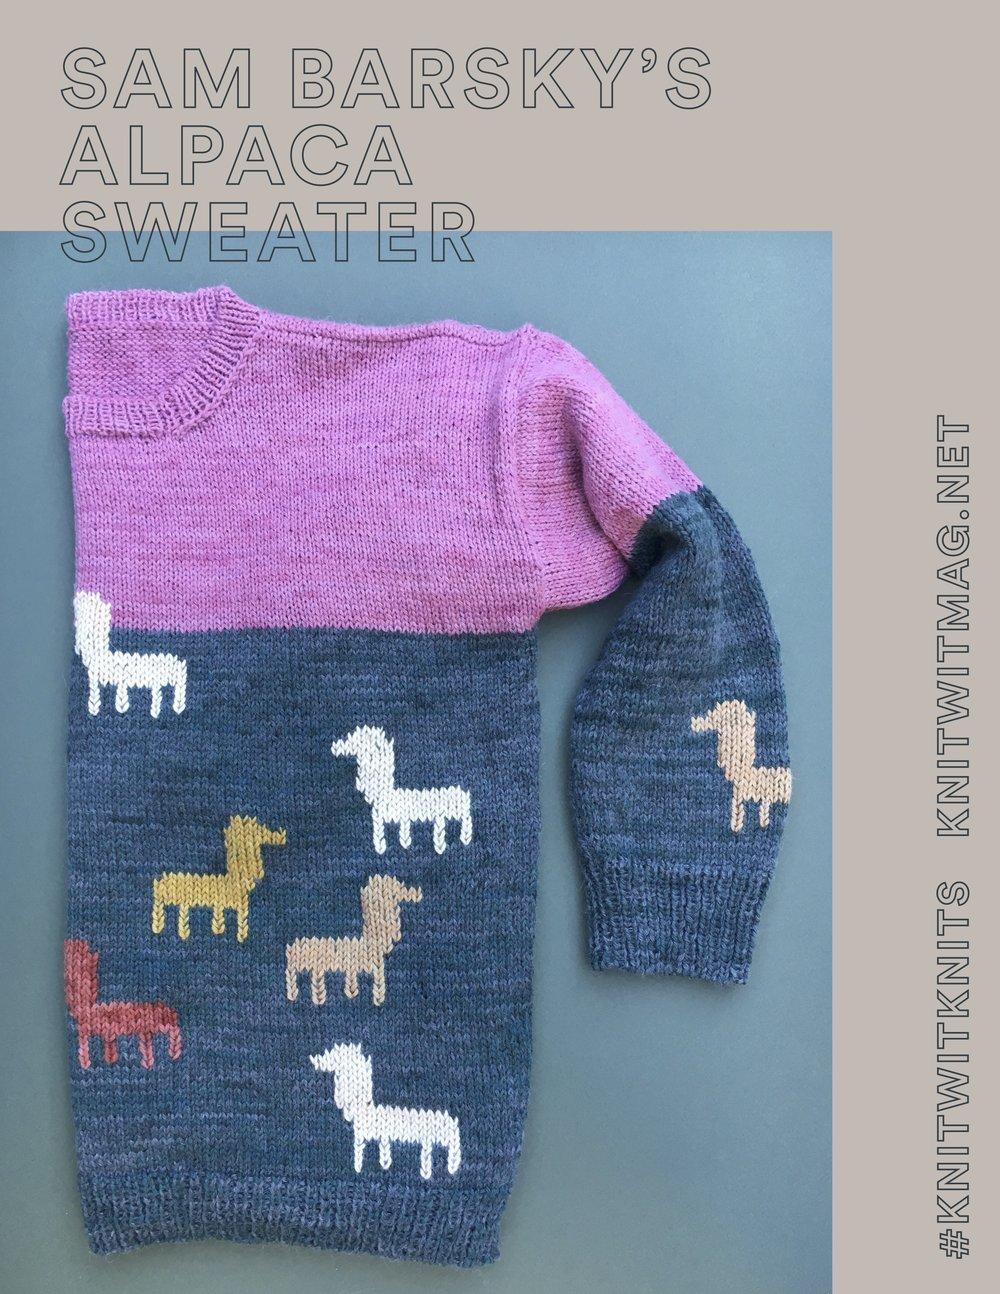 Knit Wit_Sam Barsky Alpaca Sweater.jpg